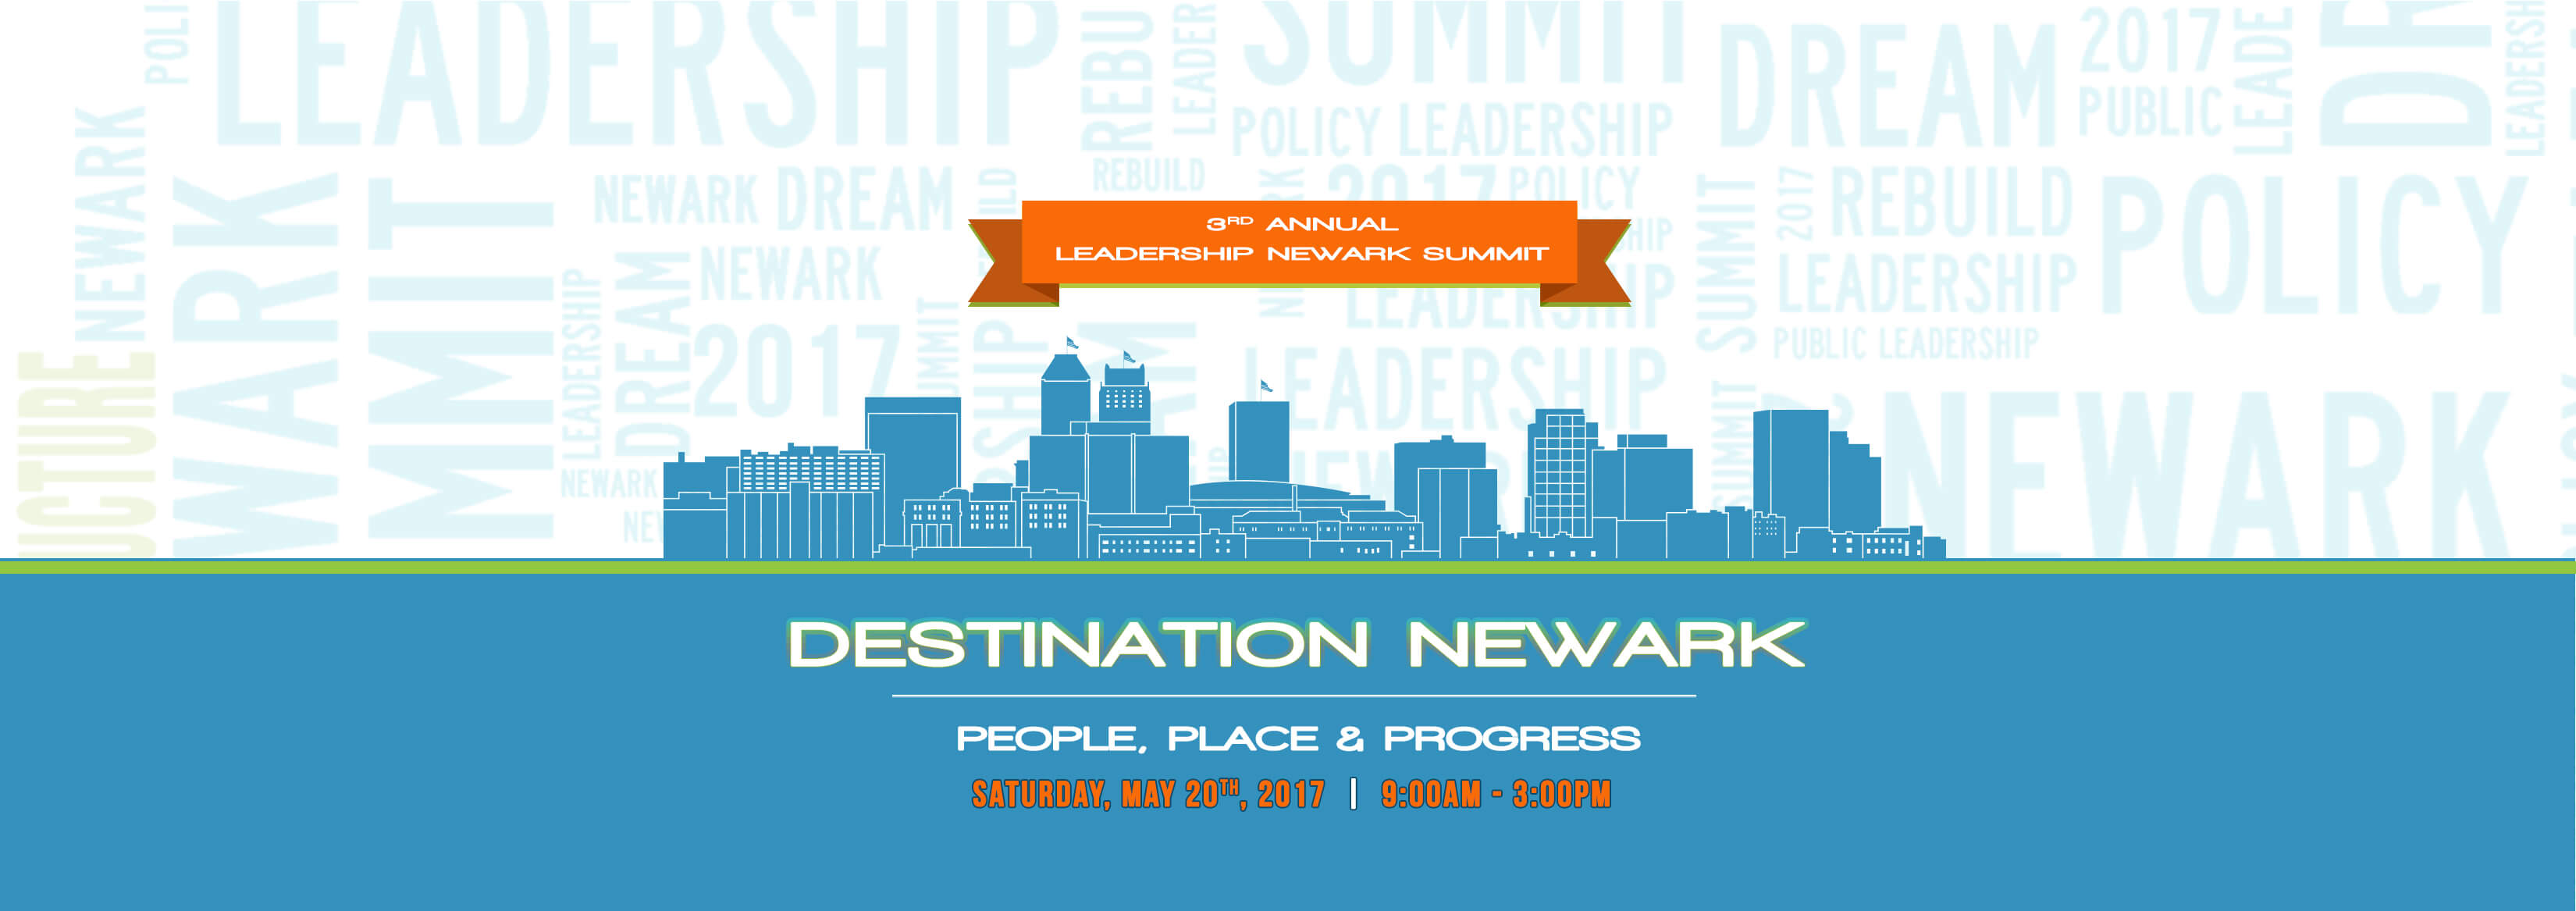 2017 destination newark people place progress leadership menu aiddatafo Image collections